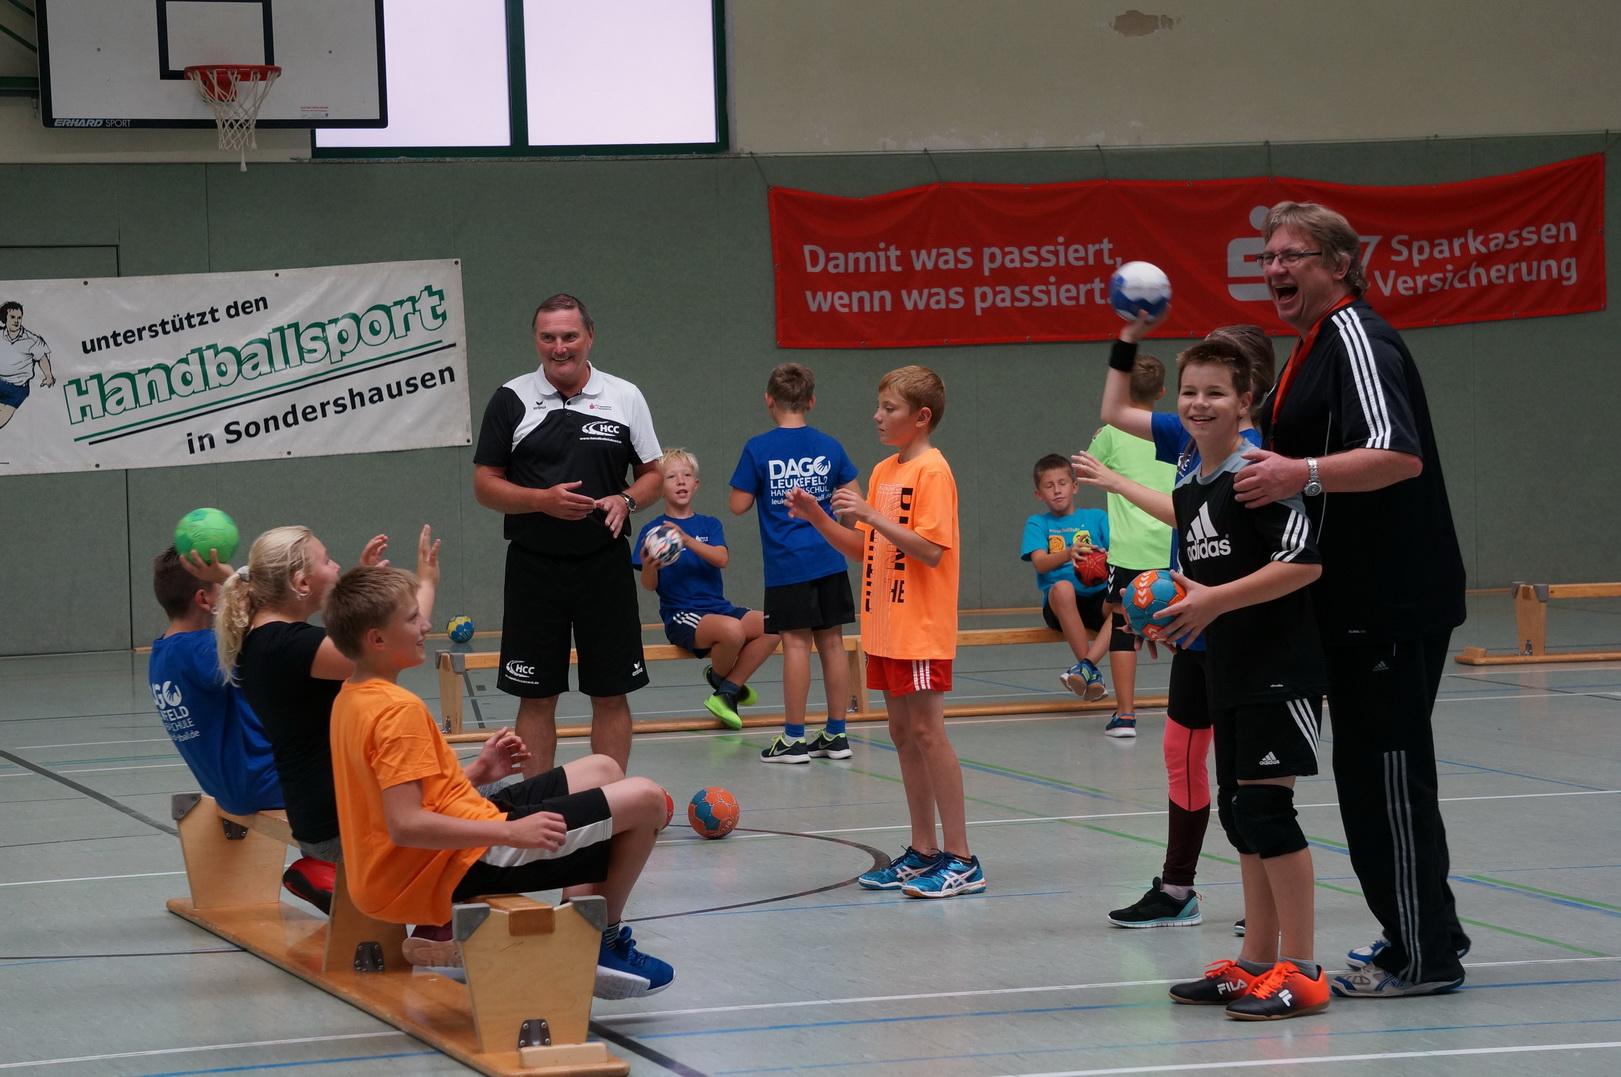 201808_Handballcamp_SDH_MG_186w